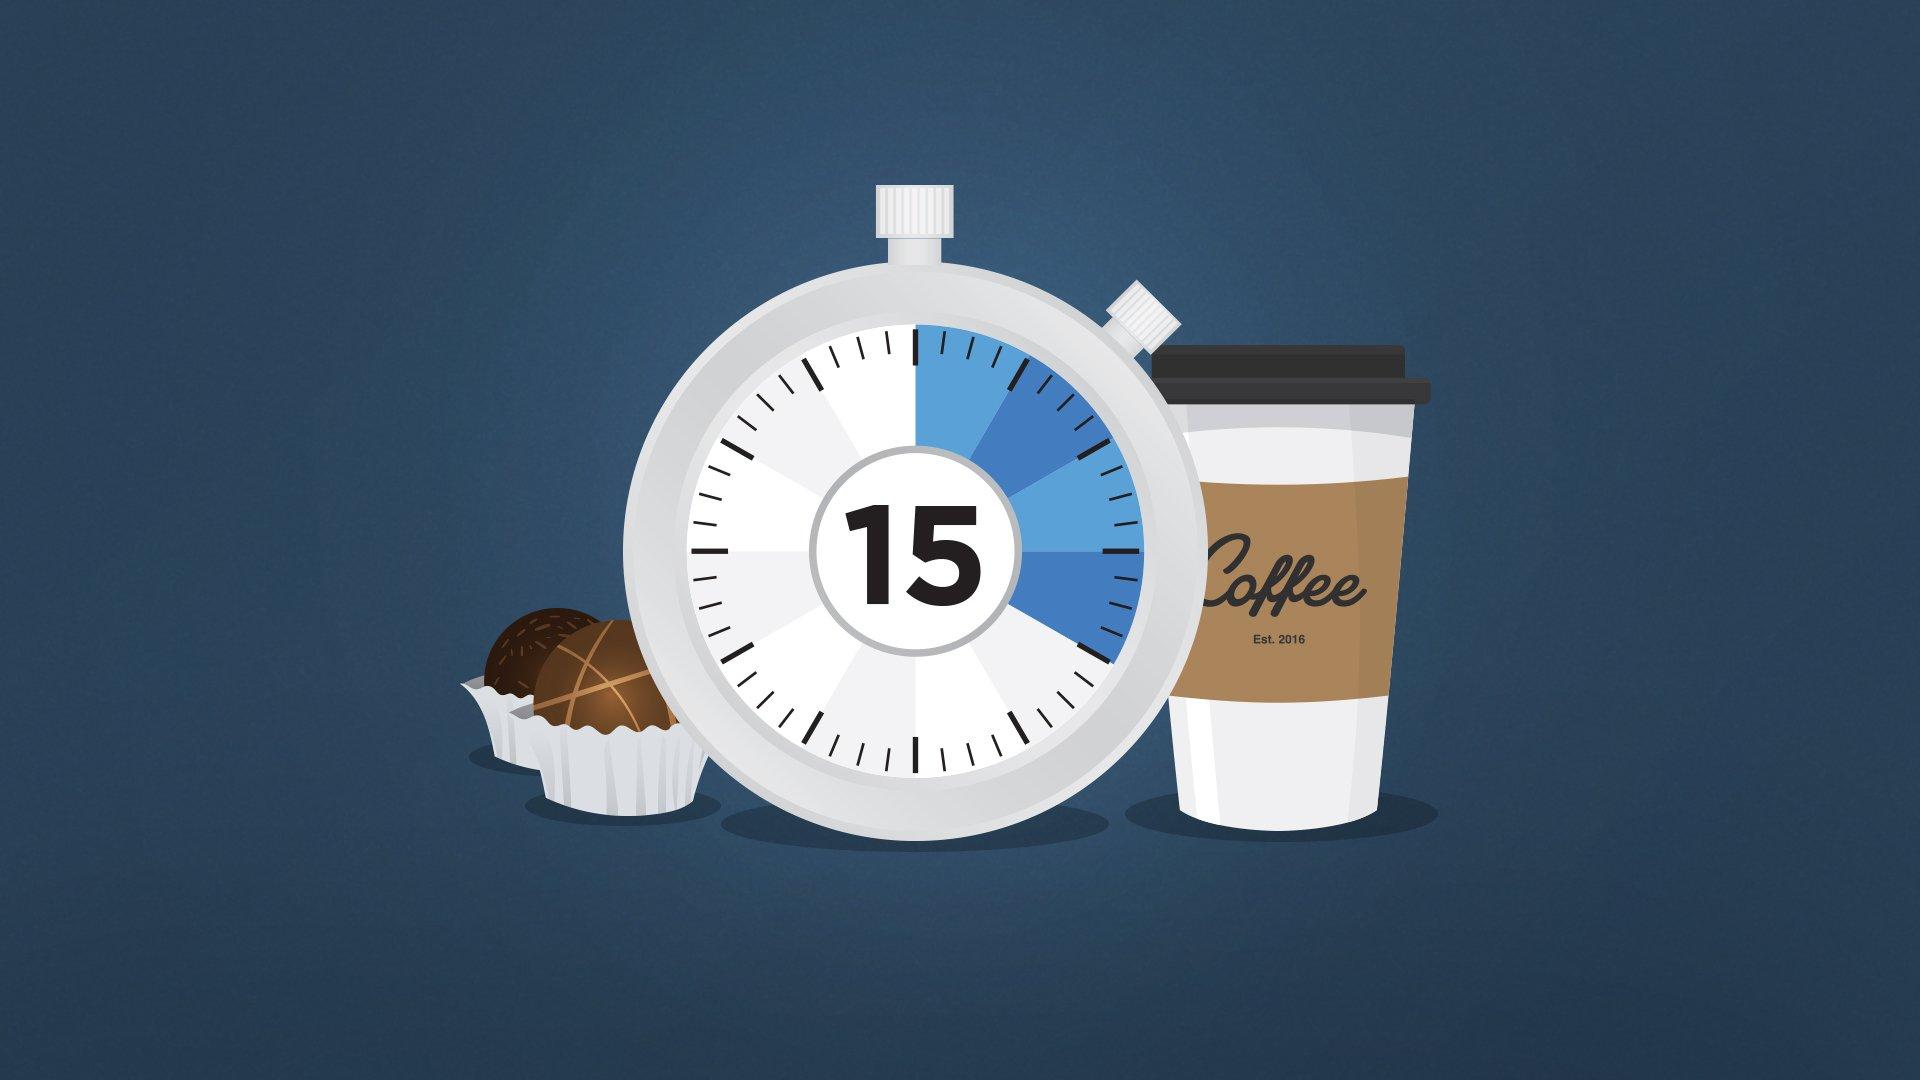 Fundamentals of the Complete 15-Minute Break | Teamwork.com